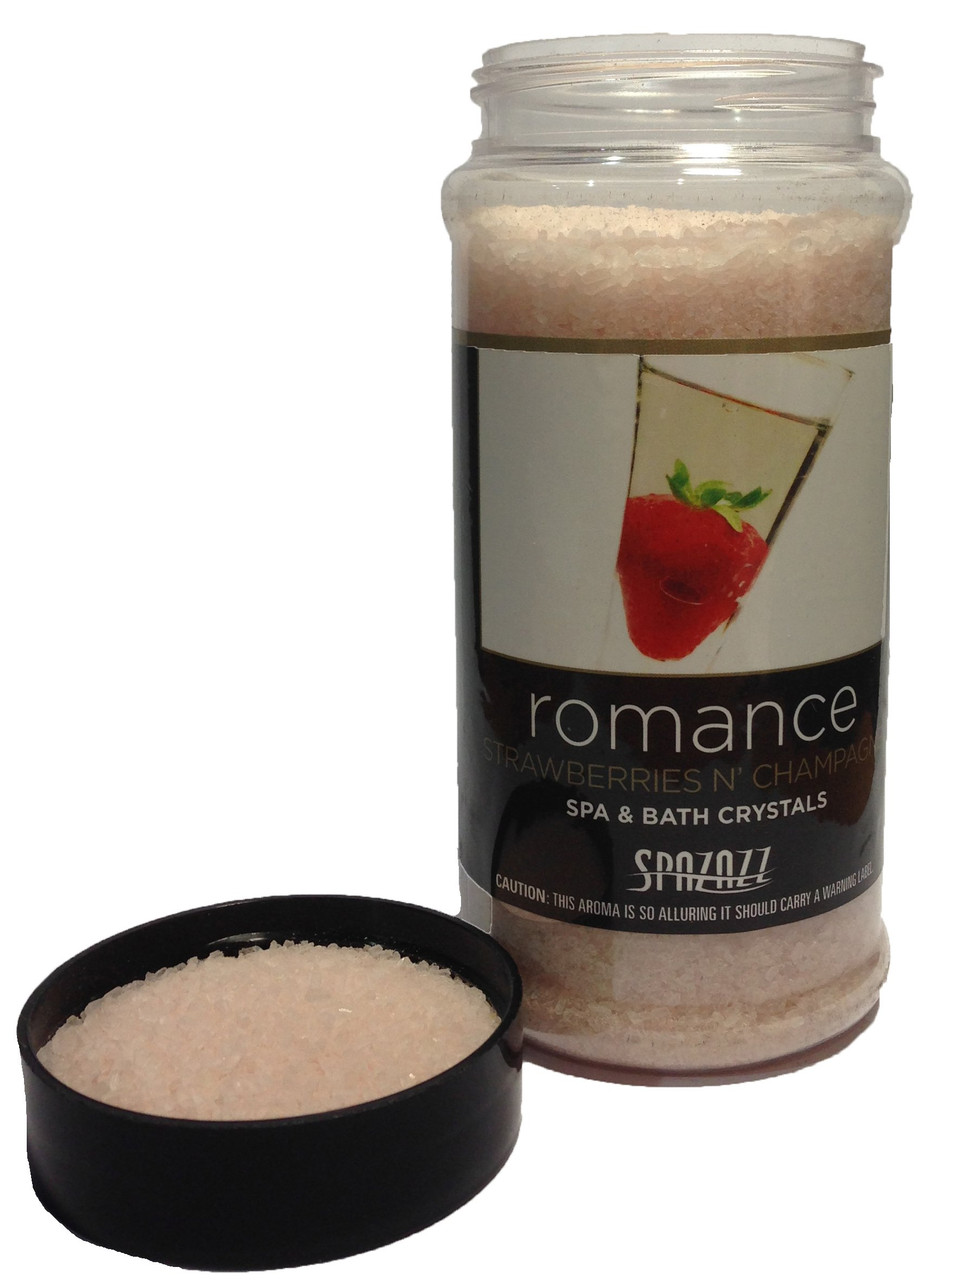 Spazazz Crystals, Strawberries N' Champagne, 17oz